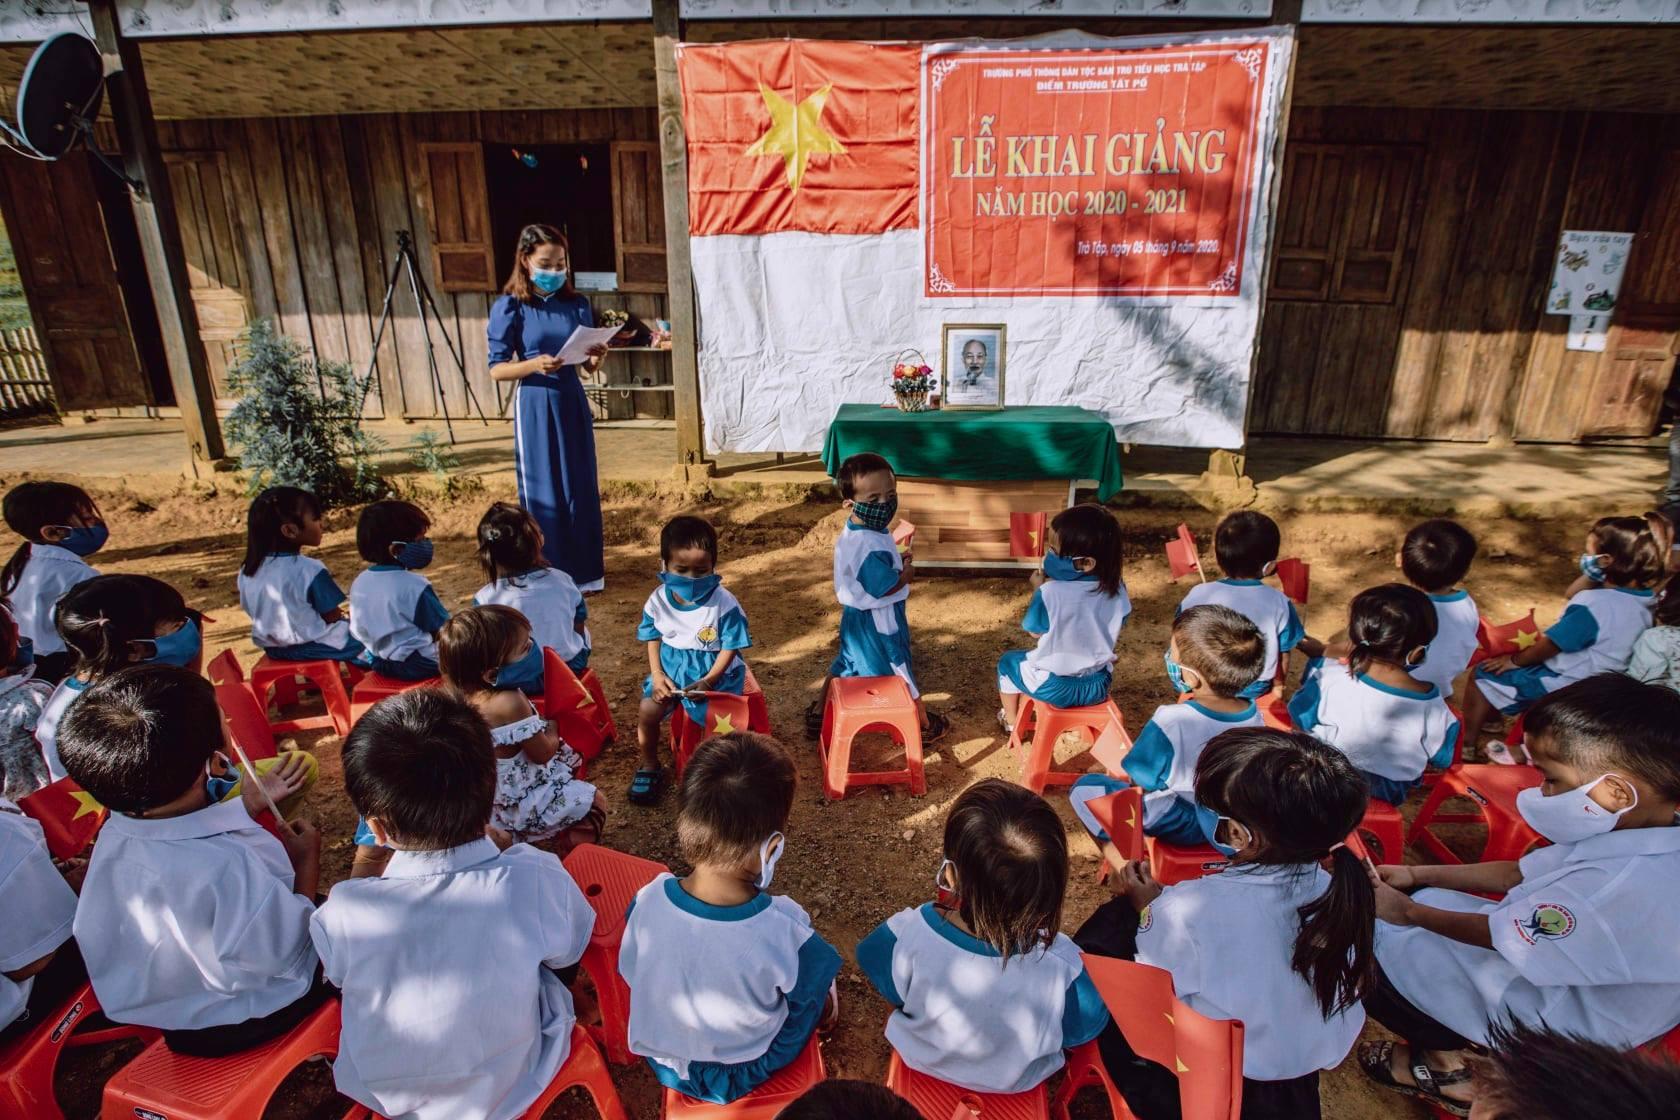 Vietnamese 'Santa' Delivers Tet Gifts To Needy Children